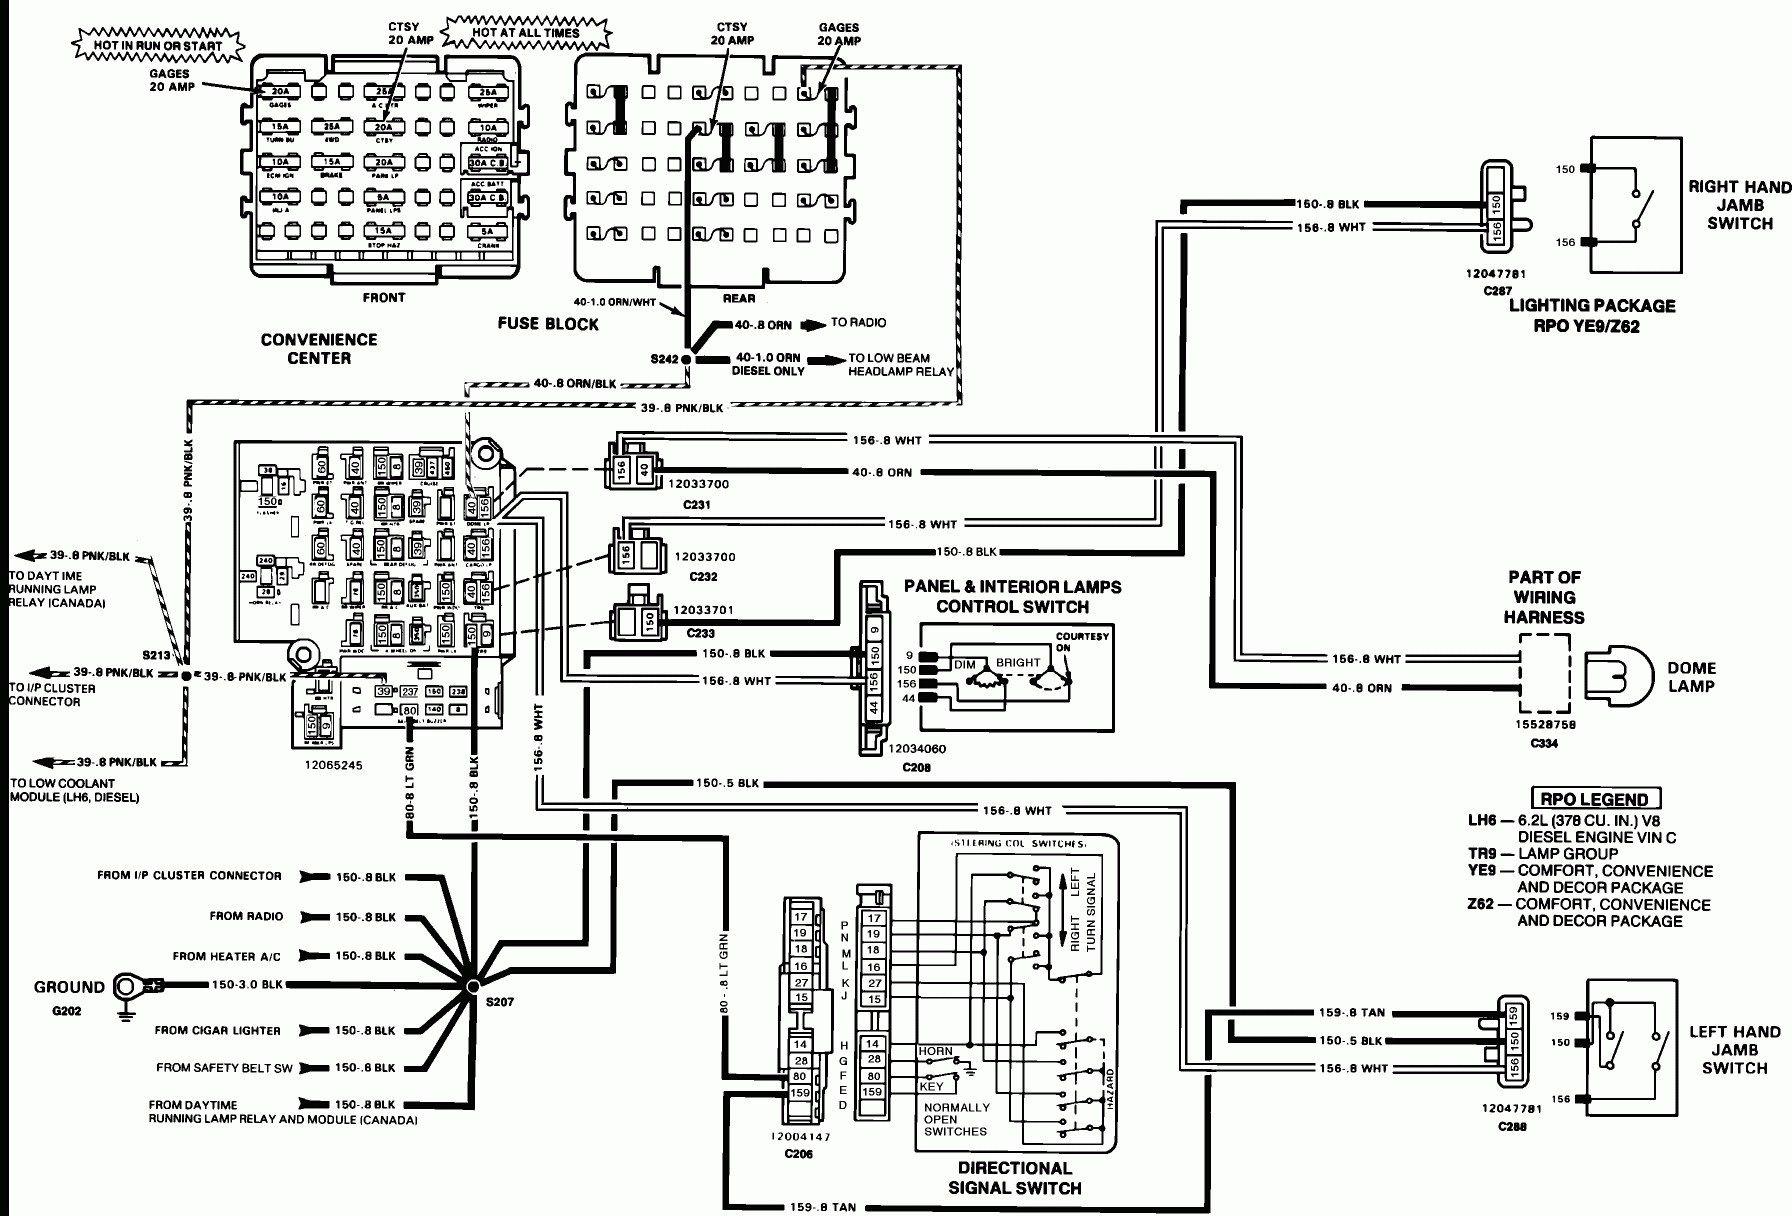 84 Chevy Truck Wiring Diagram | Electrical diagram, Chevy ... on dodge ram 700, dodge wiring diagrams, dodge ram 1500 wiring, dodge ram rock, dodge ram diagrams, dodge ram speakers, dodge avenger wiring schematics, dodge magnum wiring schematics, dodge ram wiring connectors, dodge ram srt 10, dodge challenger wiring schematics, dodge dakota wiring schematic, dodge ram diagnostic codes, dodge ram 4.7 engine, dodge caravan wiring schematic, dodge ram wiring harness, dodge ram 5.9 engine, dodge sprinter radio wiring, dodge ram logo,